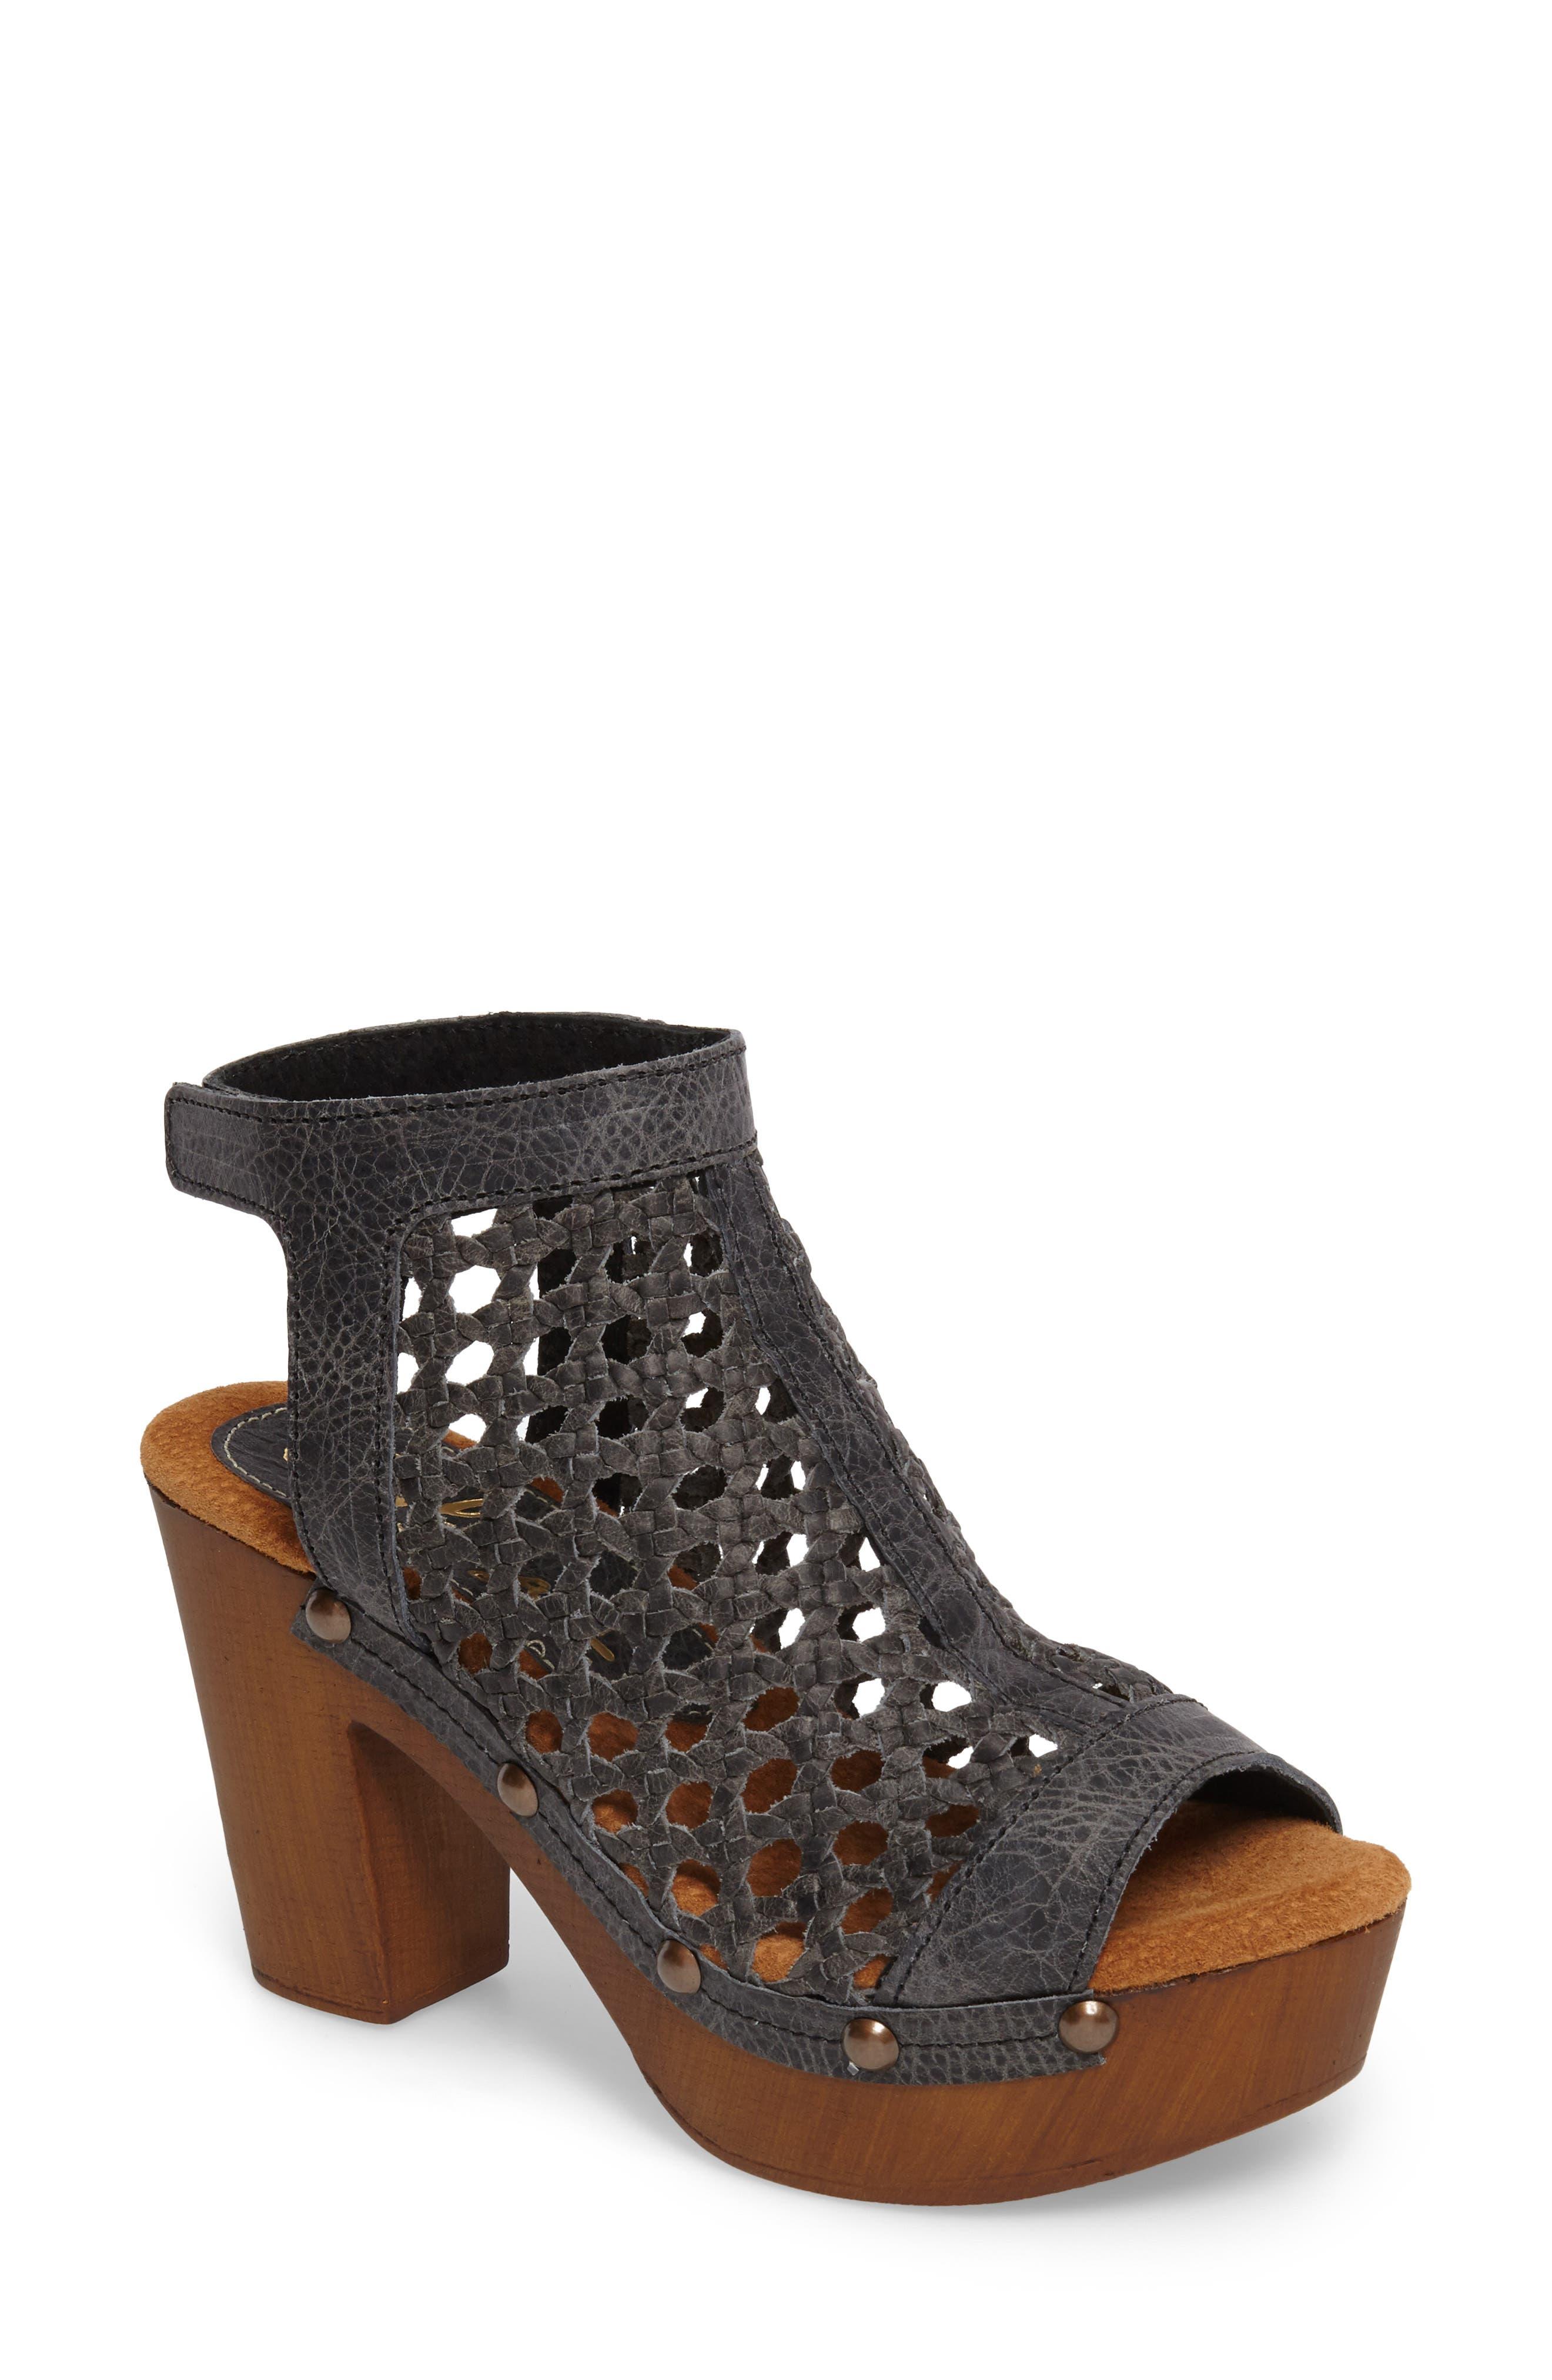 Alternate Image 1 Selected - Sbicca Outlast Woven Sandal (Women)